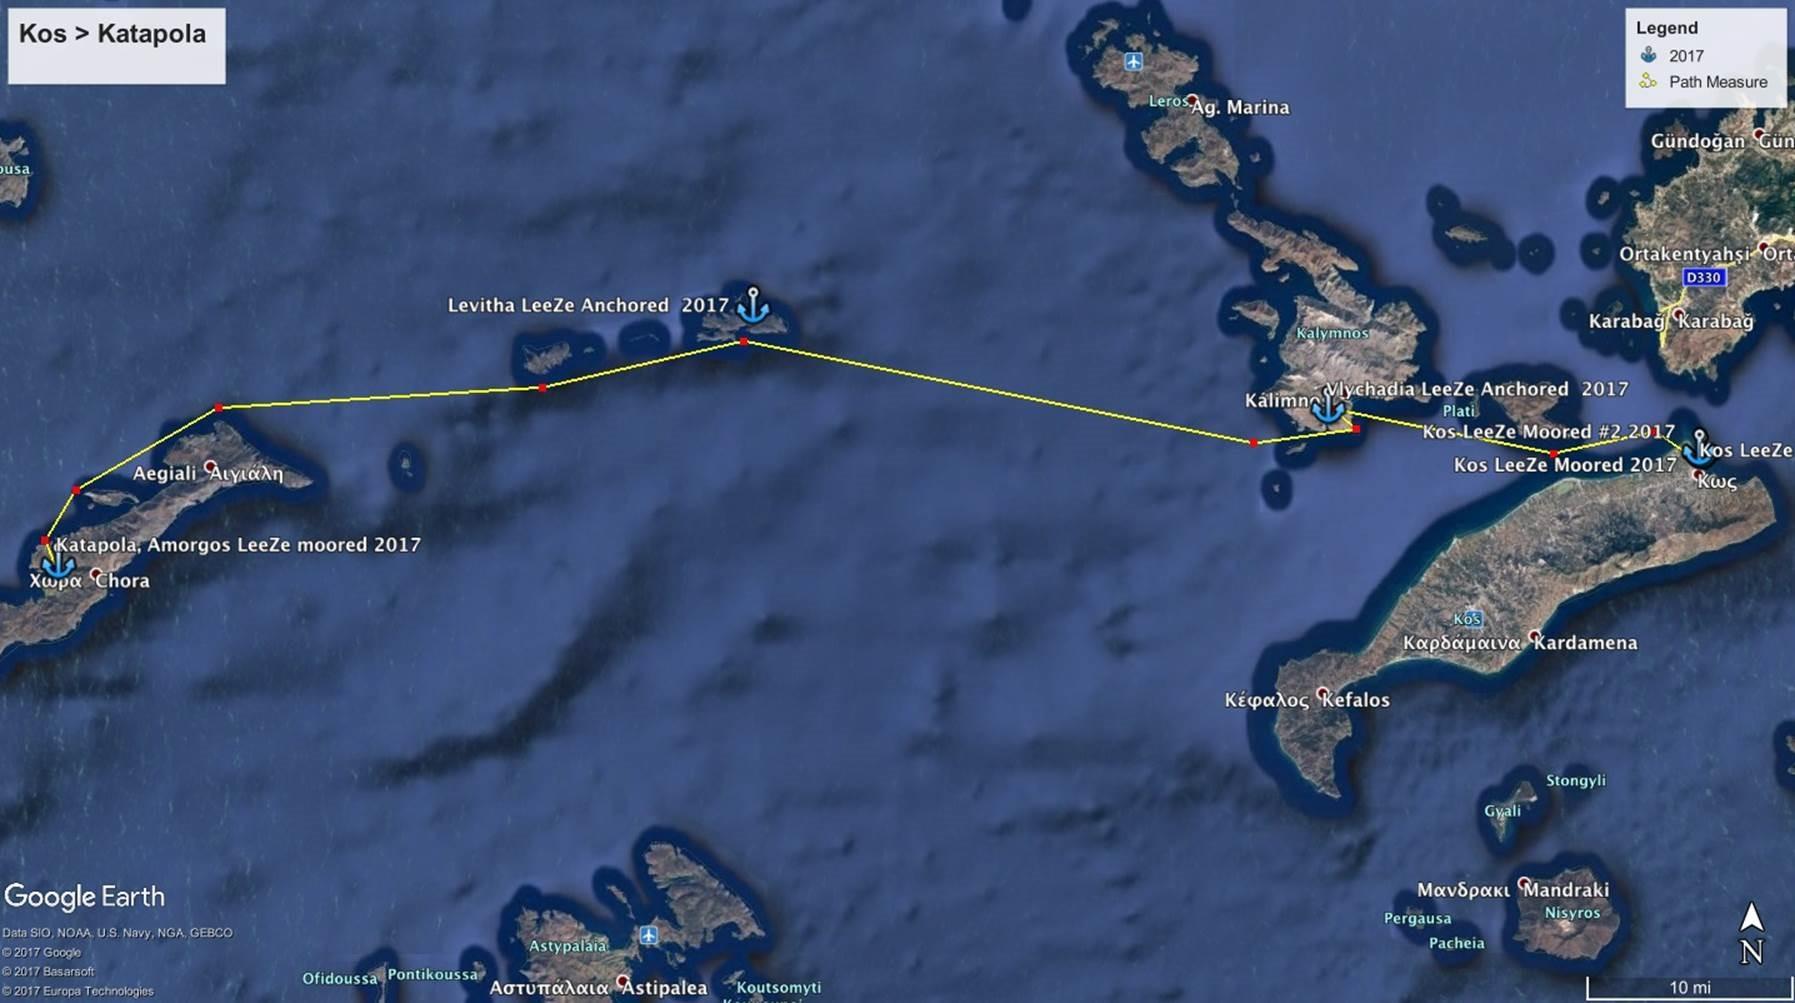 George Buehler Trawler in Kos > Katapola